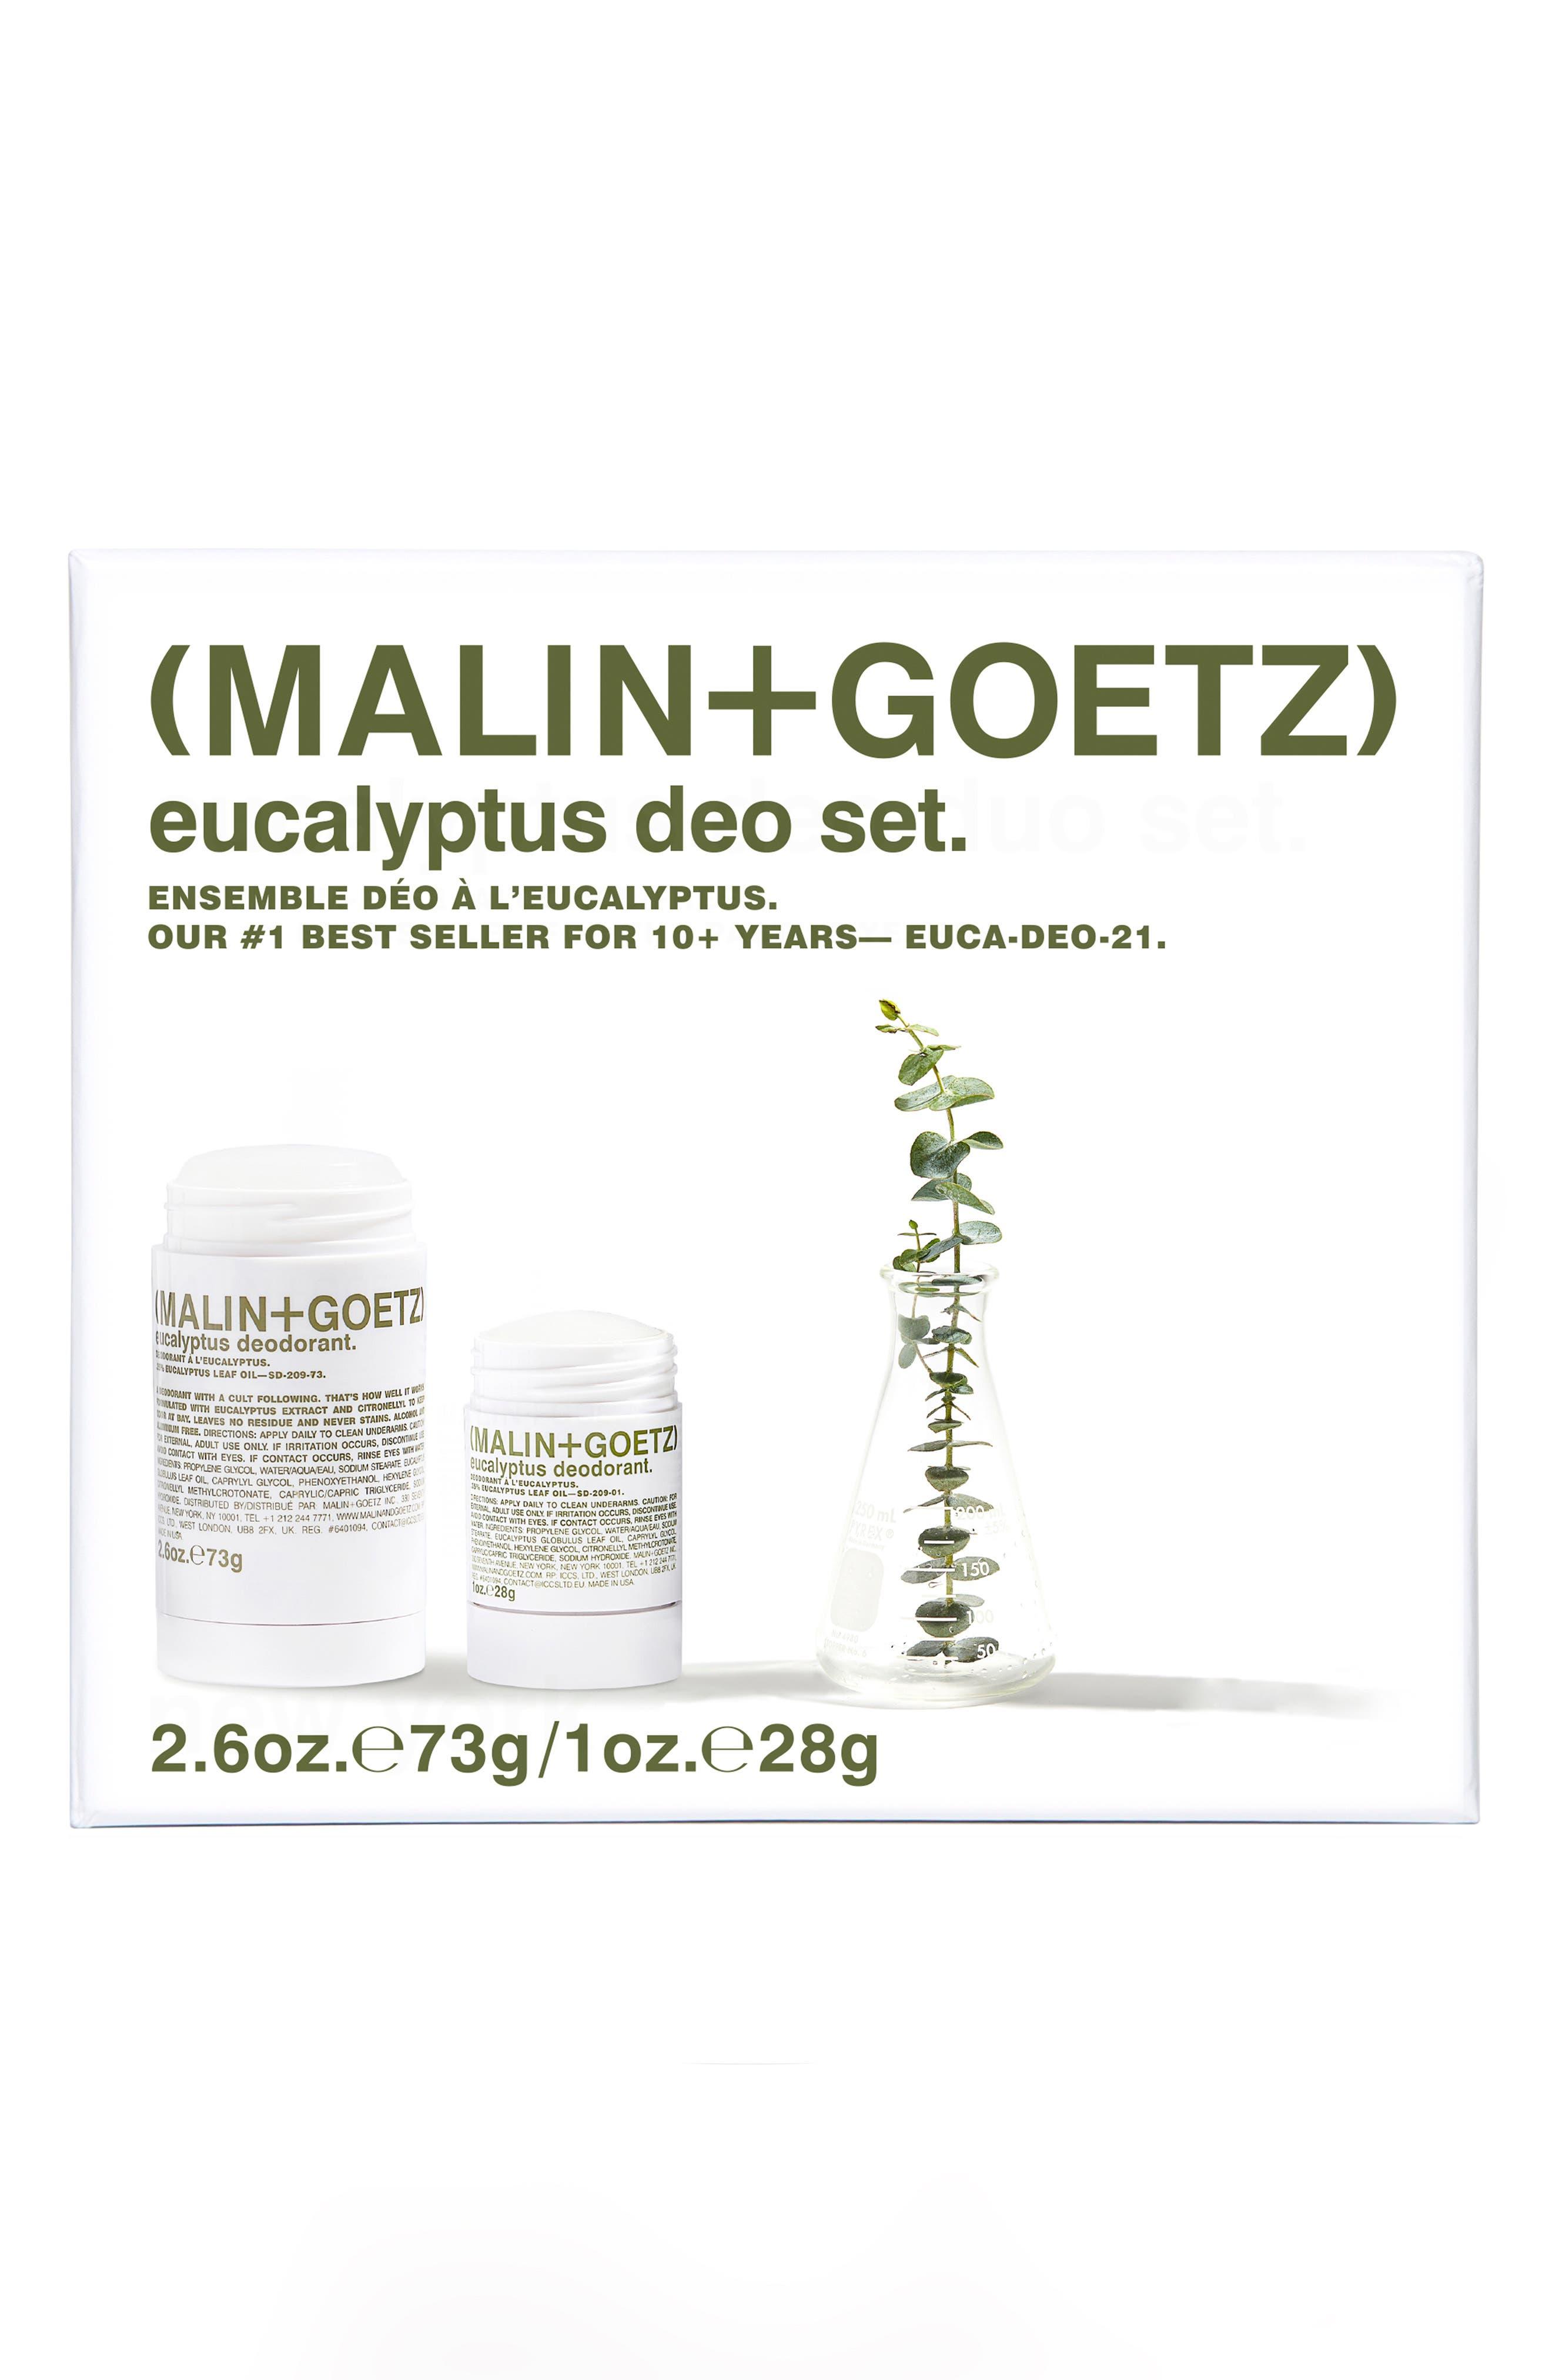 Malin+Goetz Eucalyptus Deodorant Set-$36 Value (Nordstrom Exclusive)